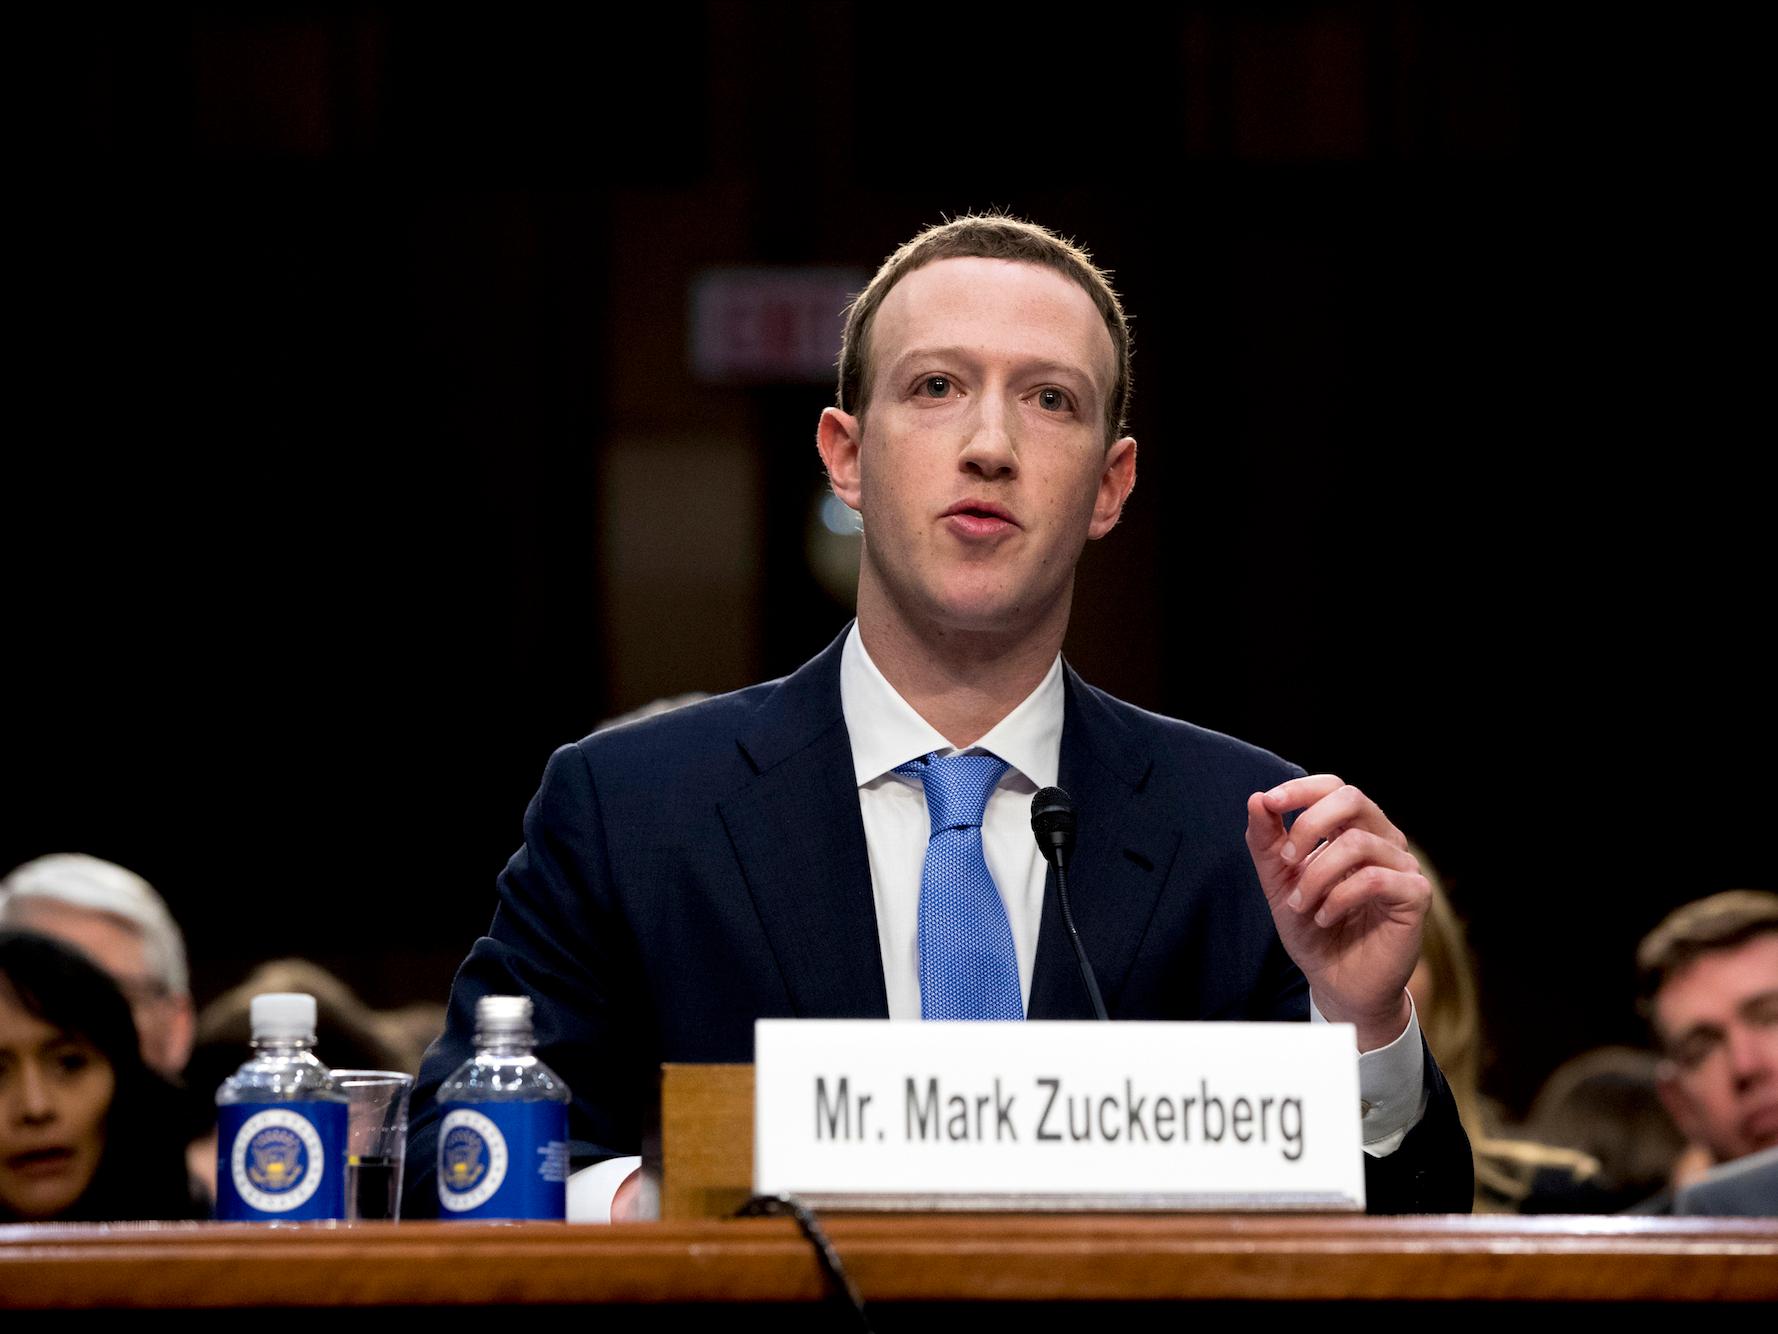 https://theins.ru/wp-content/uploads/2018/07/facebook-zuckerberg-trial-ap-59.jpg.png